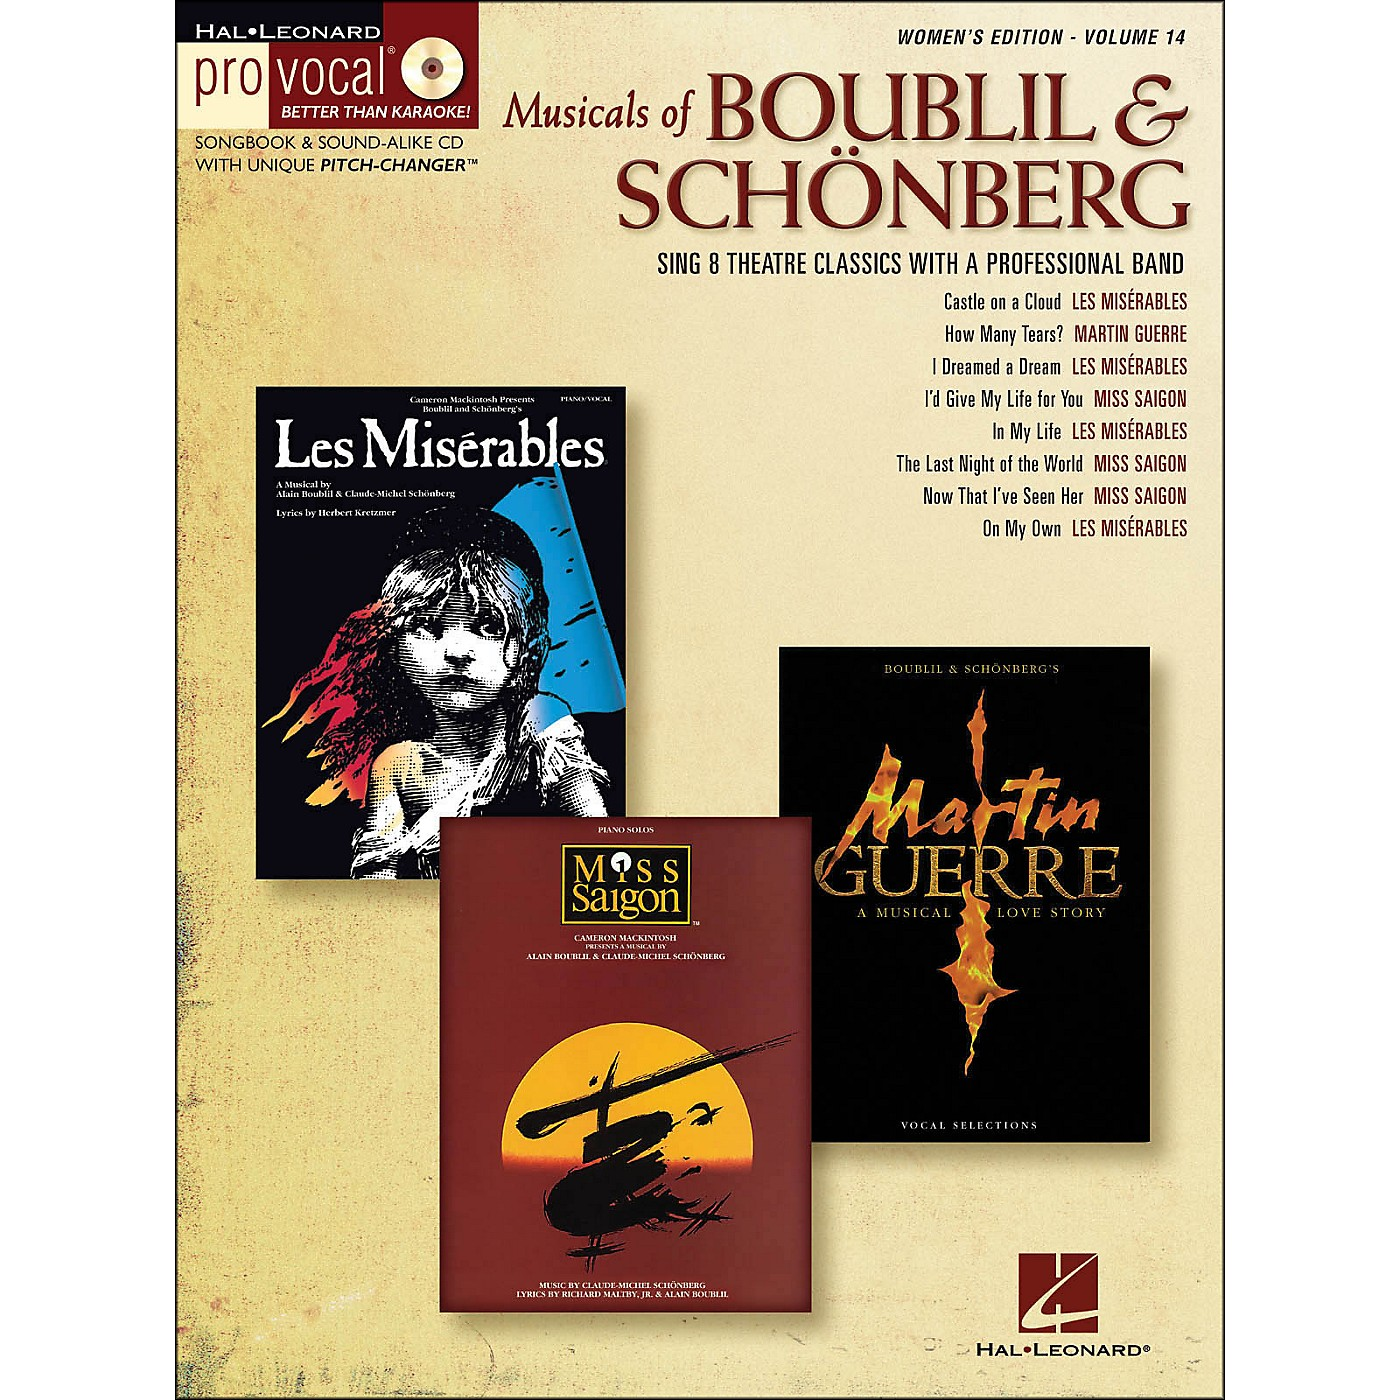 Hal Leonard Musicals Of Boublil & Schonberg - Pro Vocal Series Women's Edition Volume 14 Book/CD thumbnail